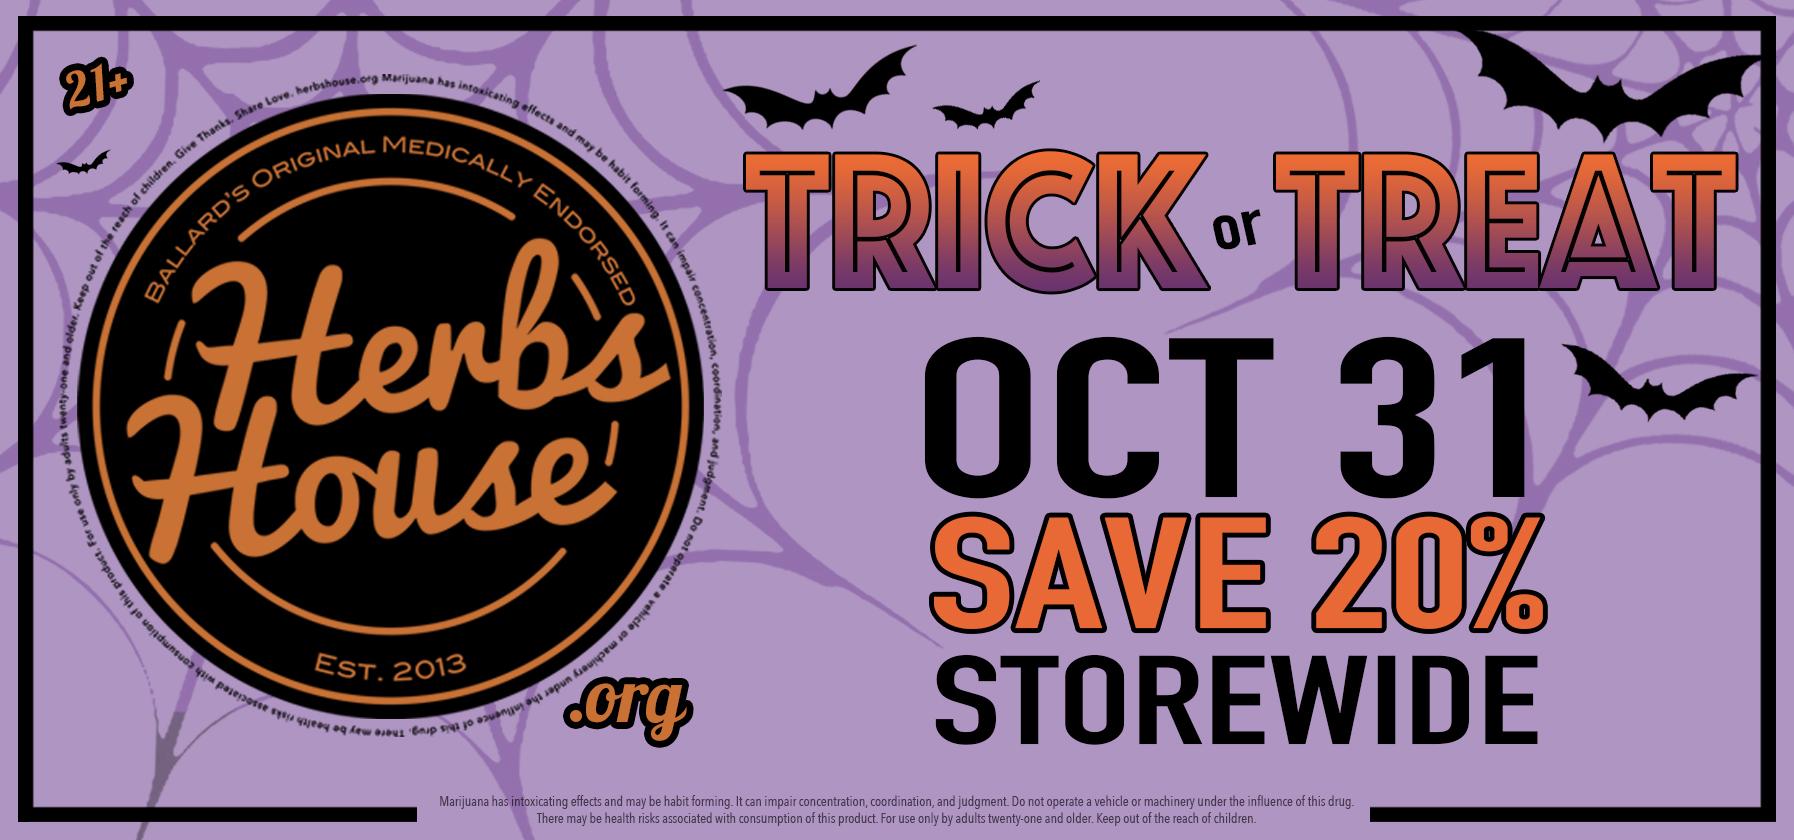 Trick or Treat - SAVE 20% Storewide Sunday Oct 31